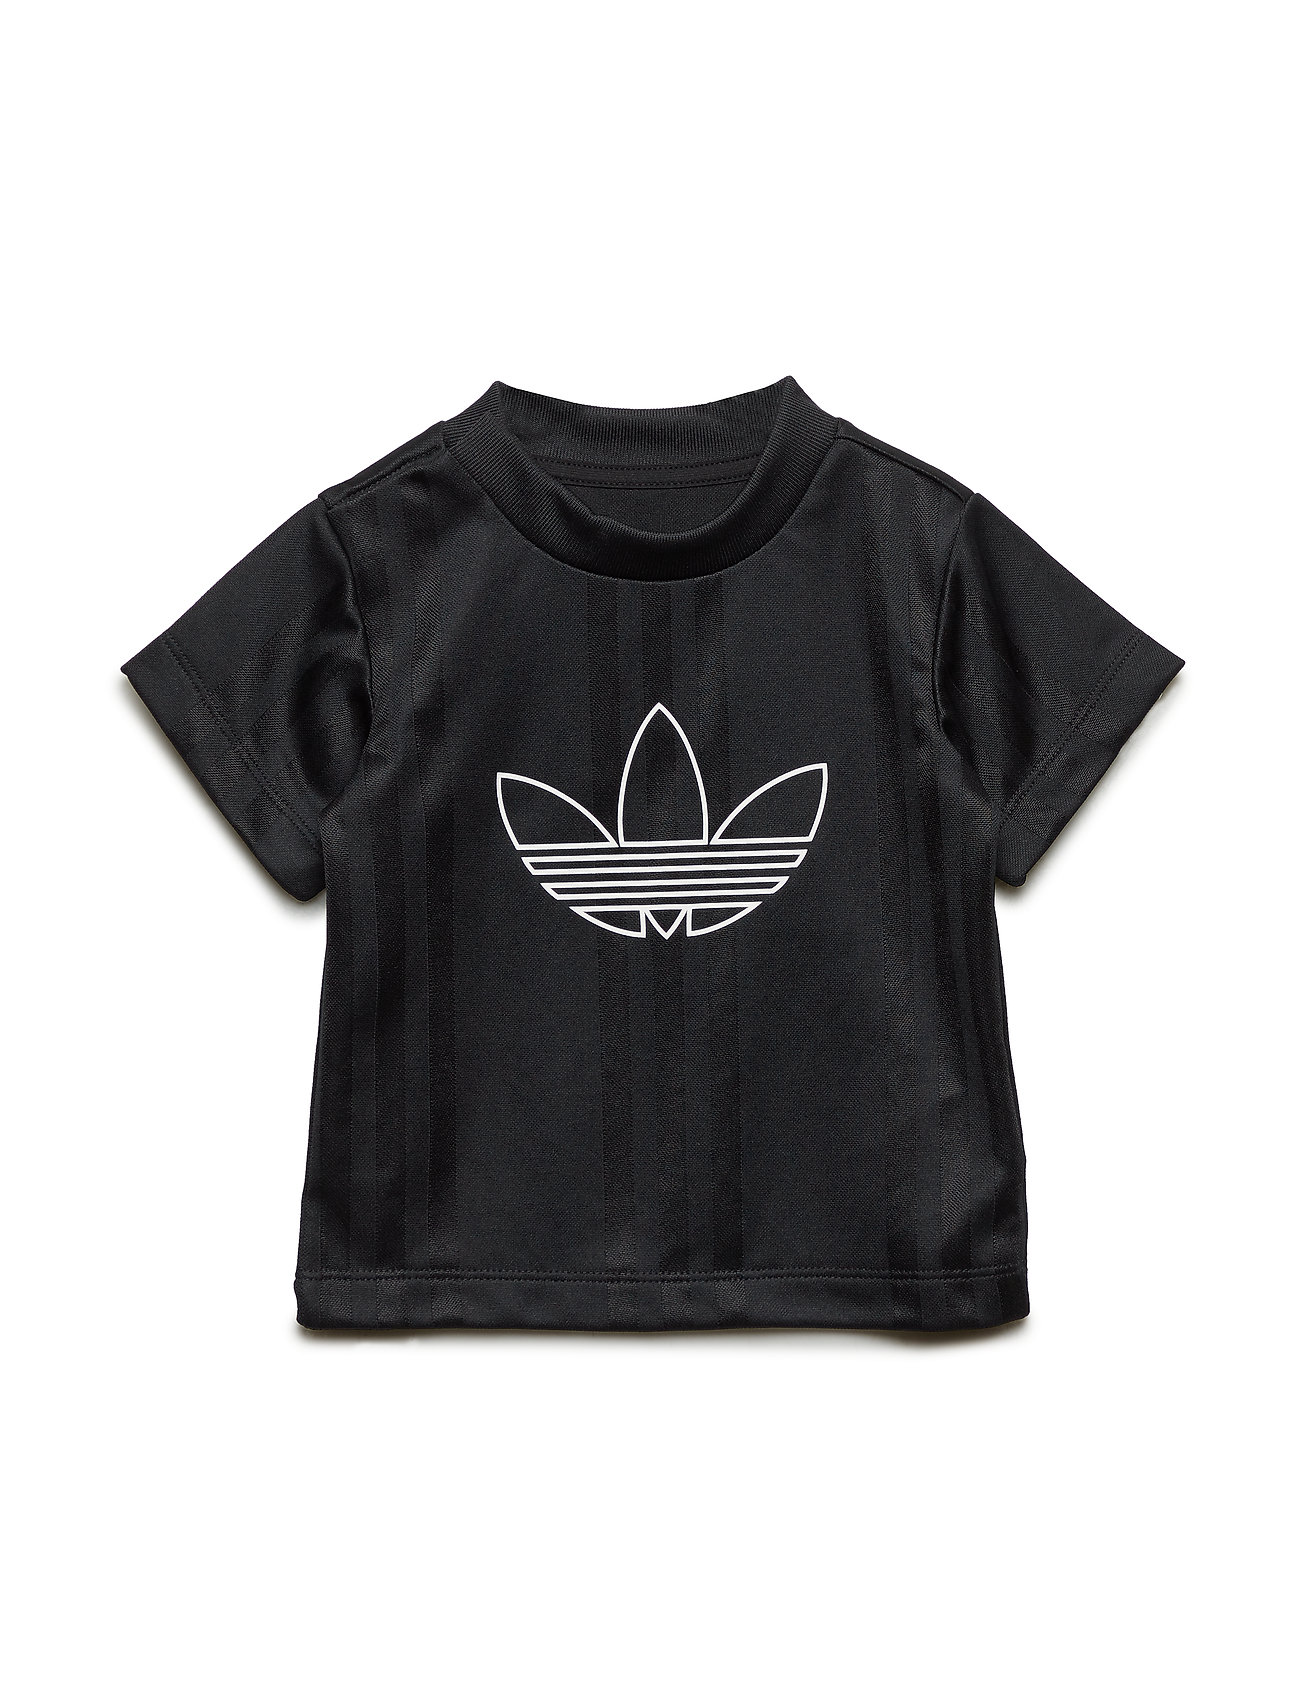 adidas Originals OUTLINE JERSEY - BLACK/WHITE